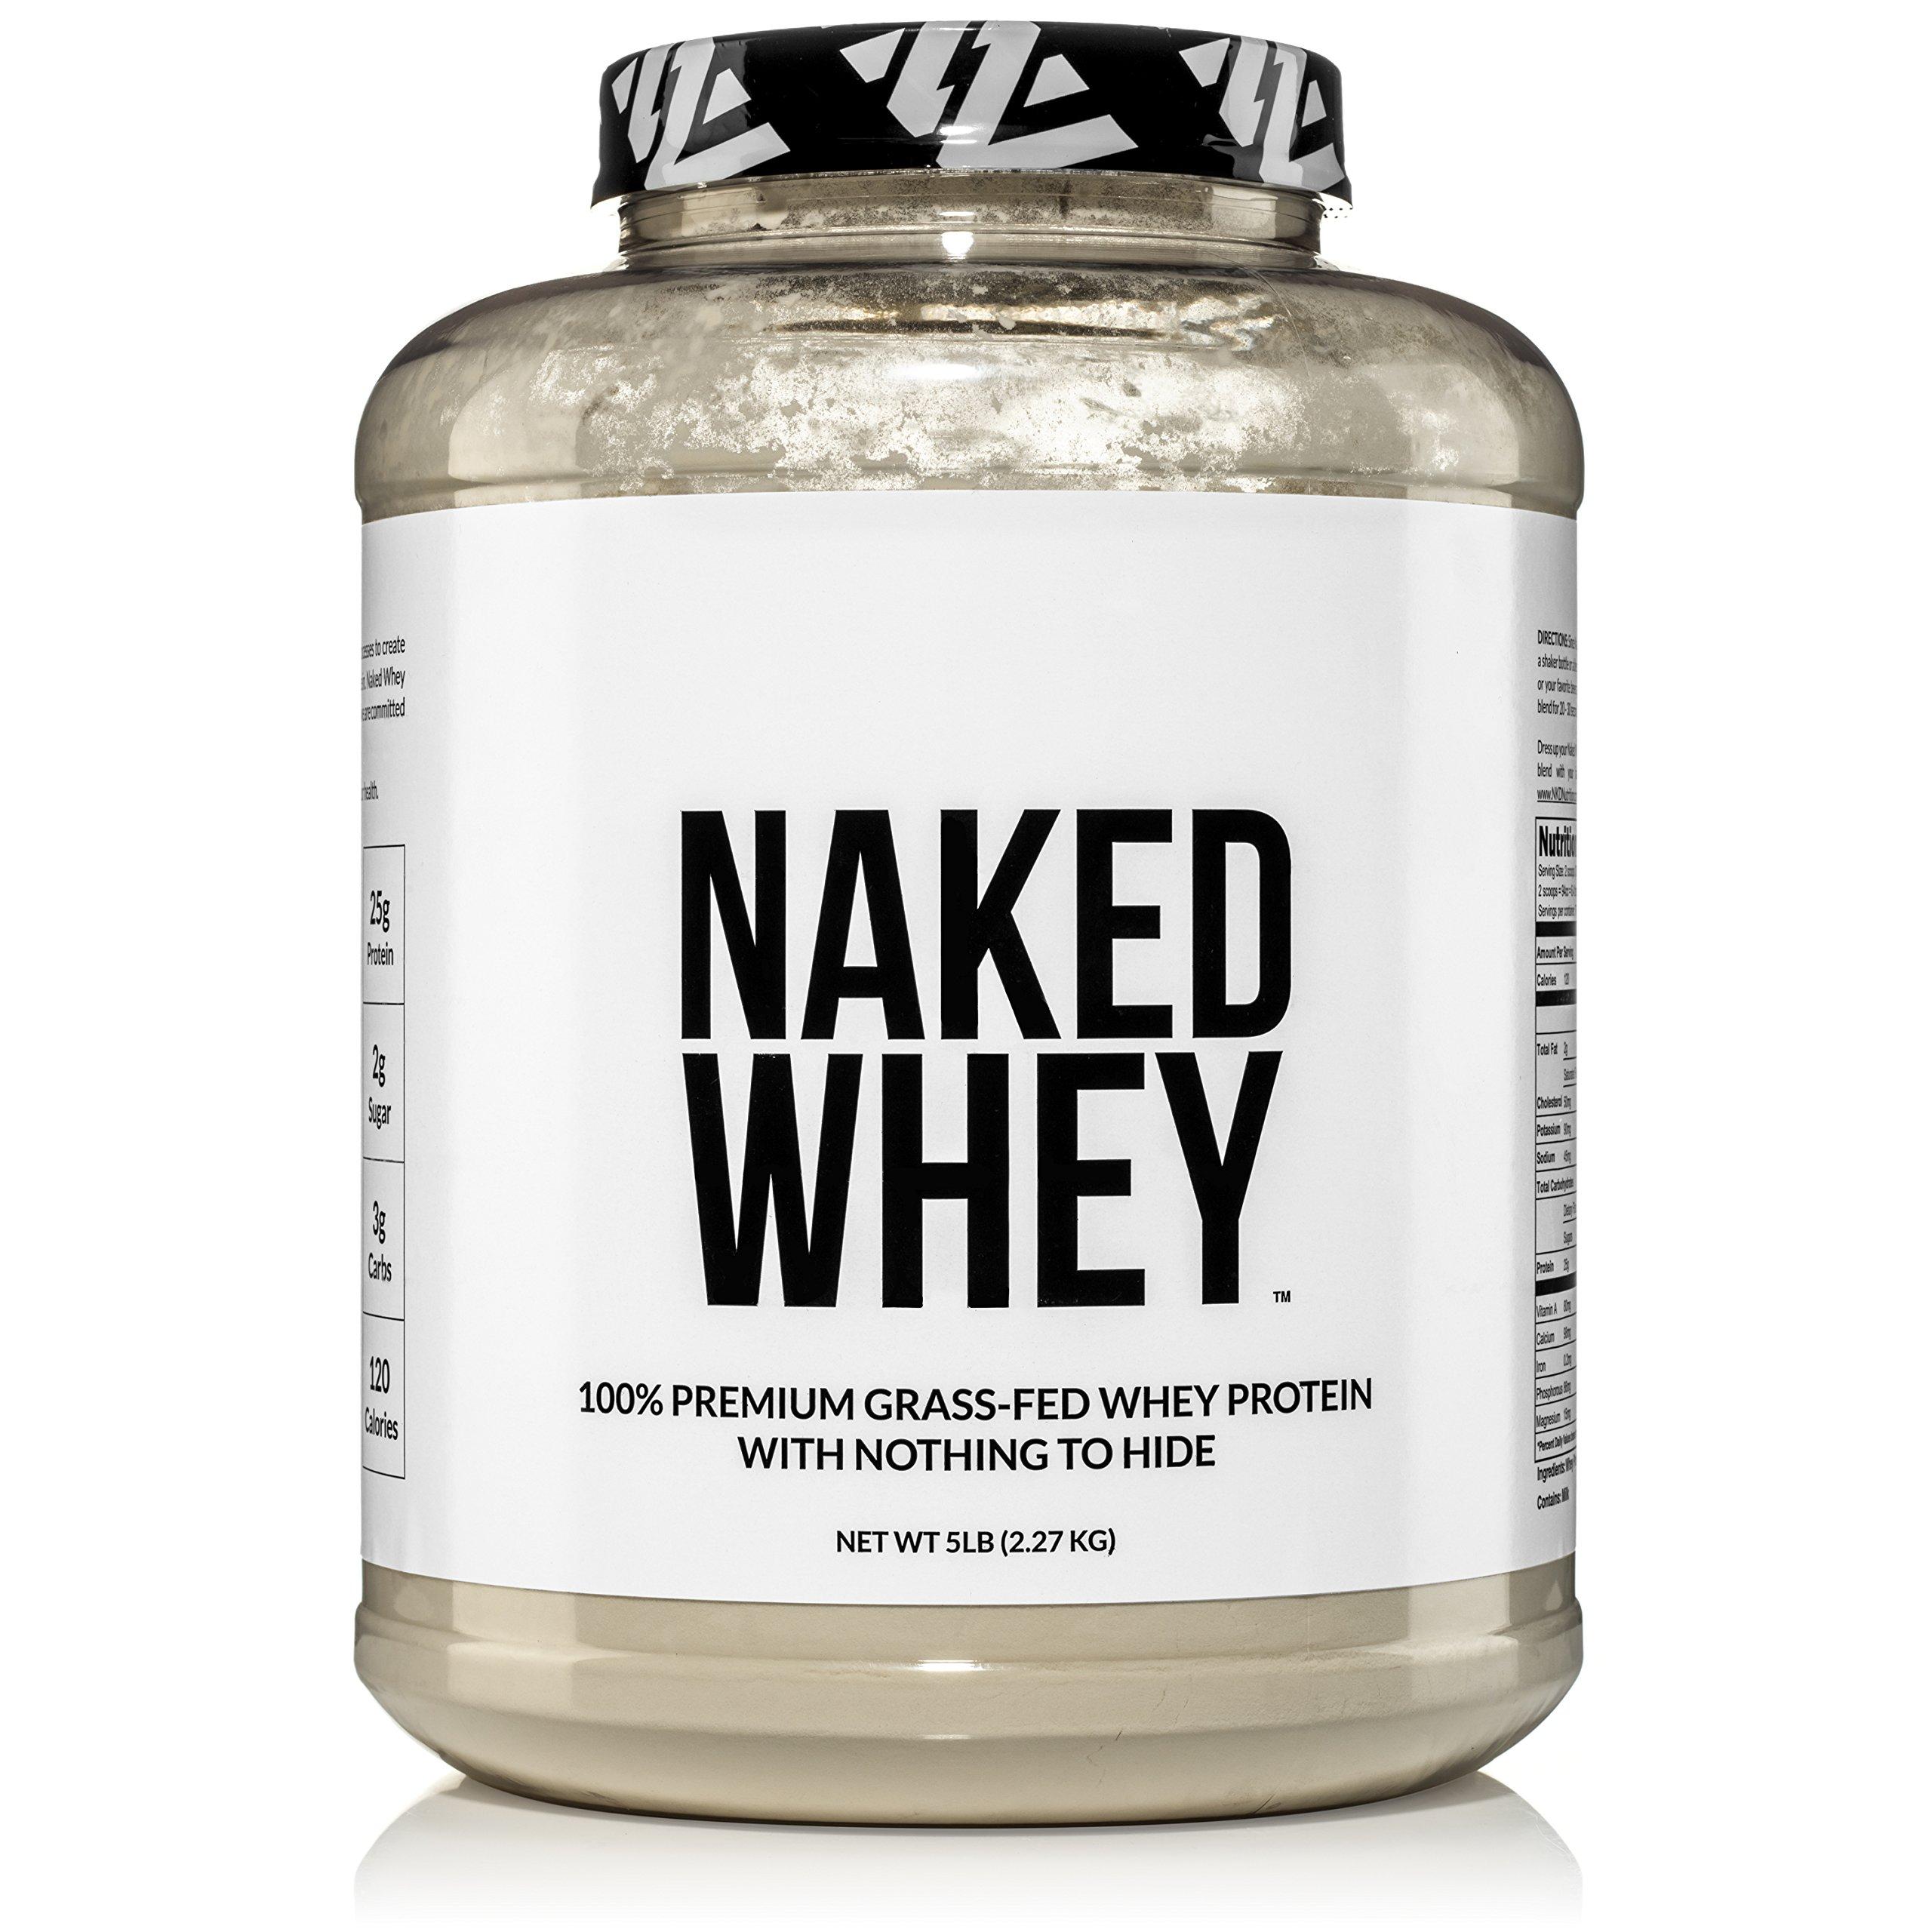 NAKED WHEY Grass Protein Powder